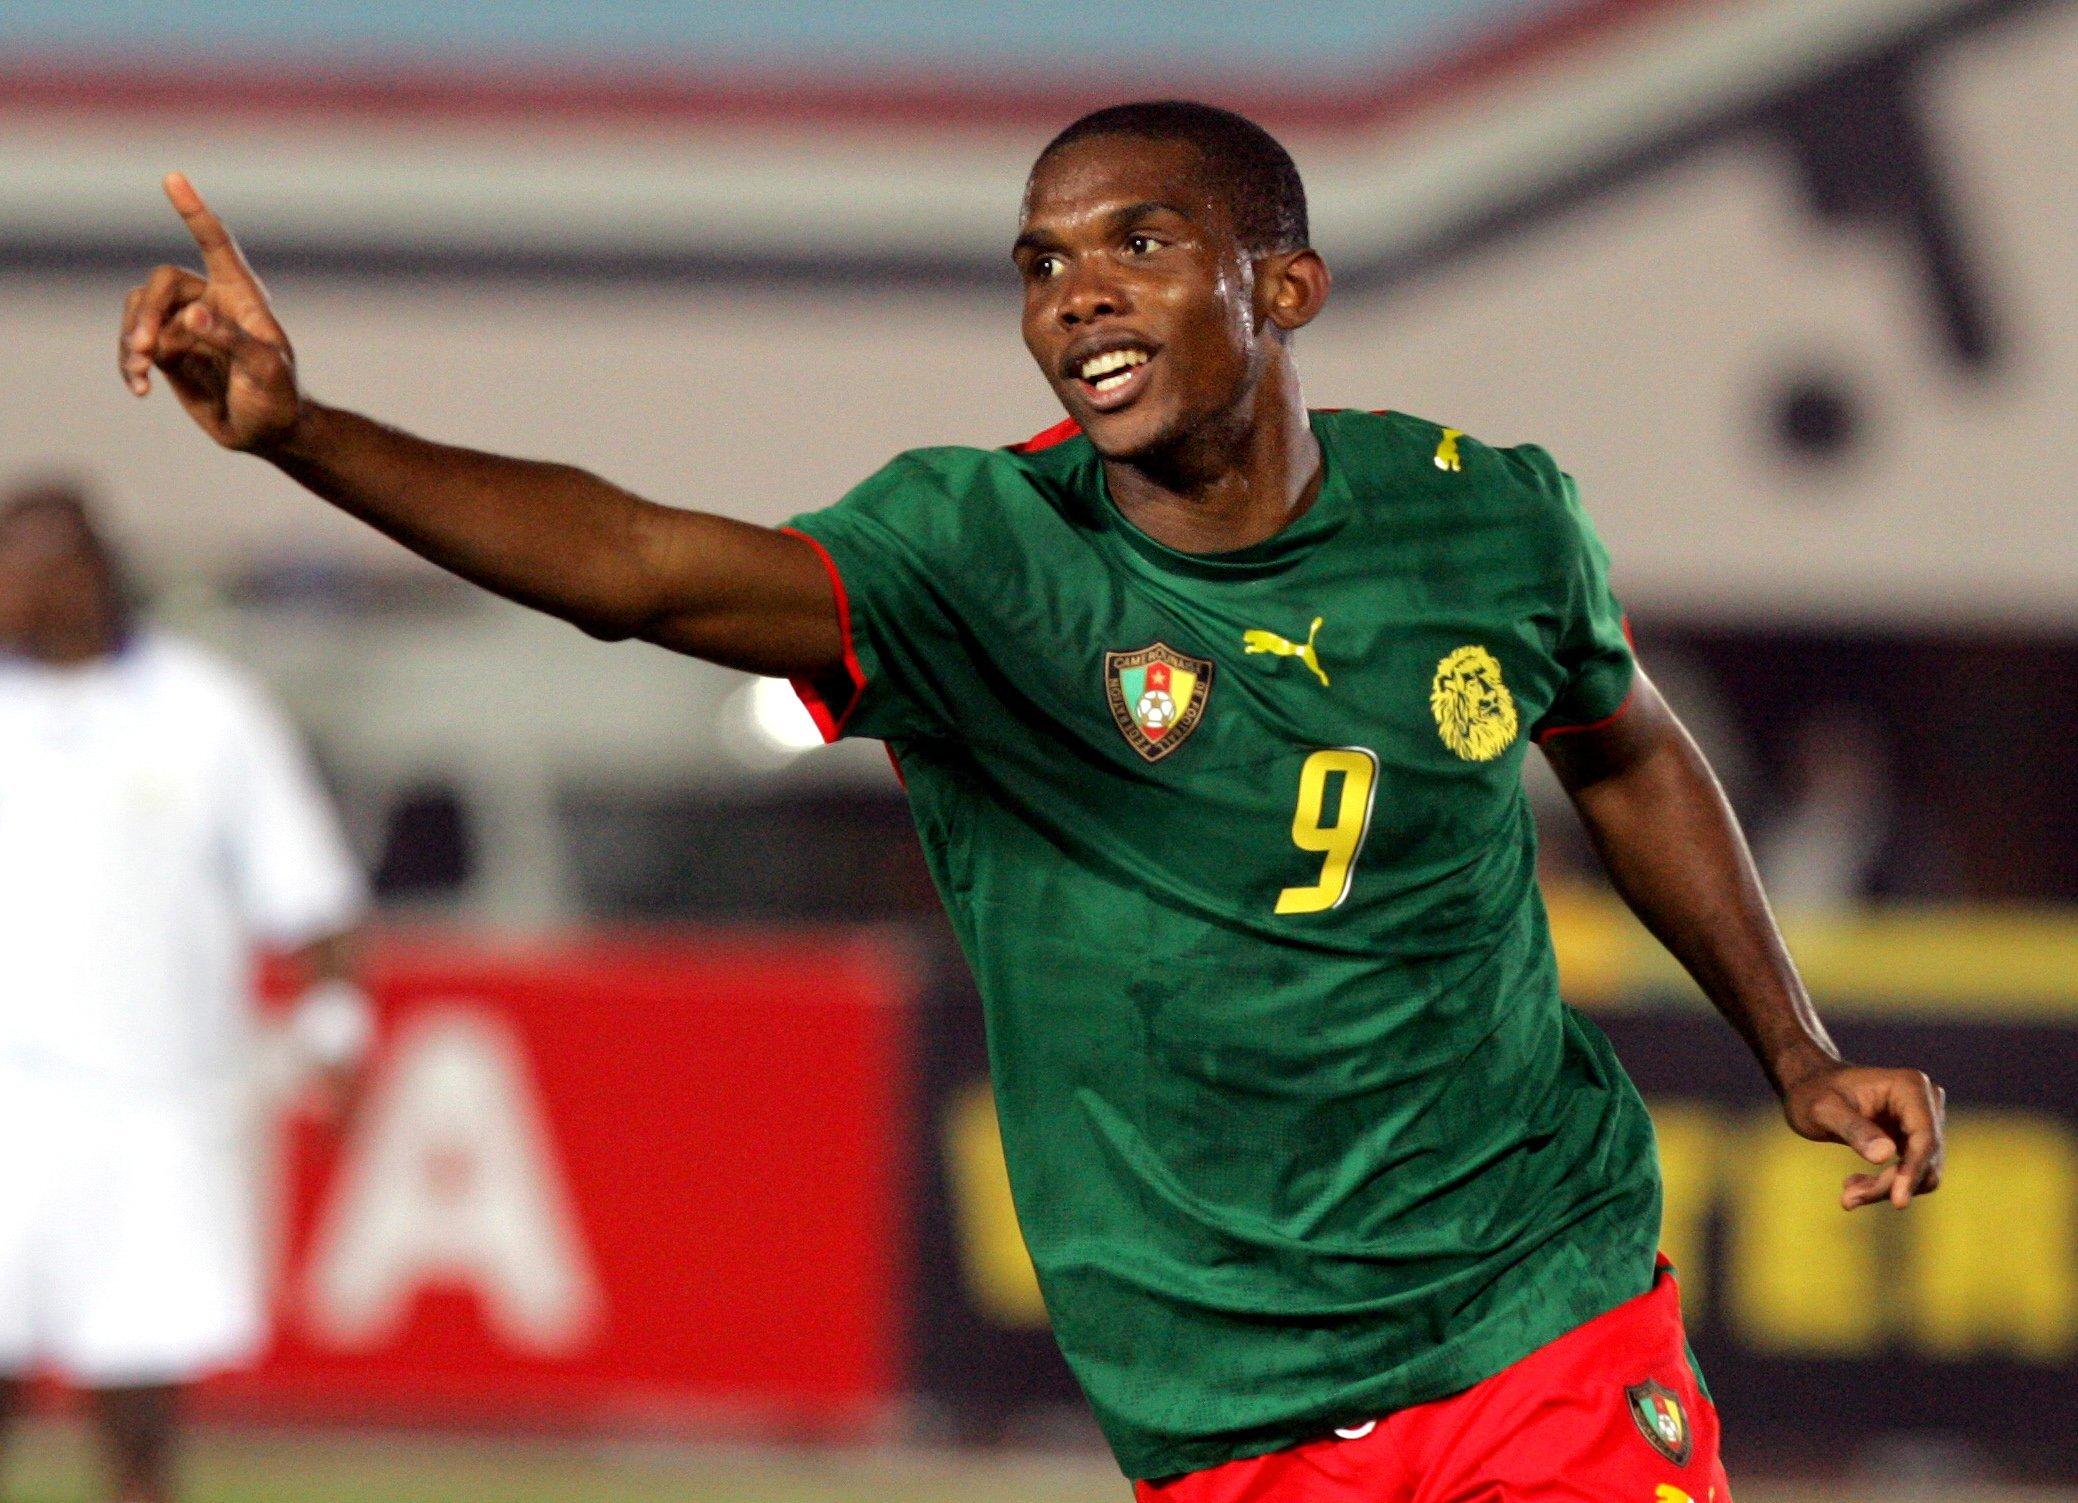 Enyeama, Eto'o, world's best player